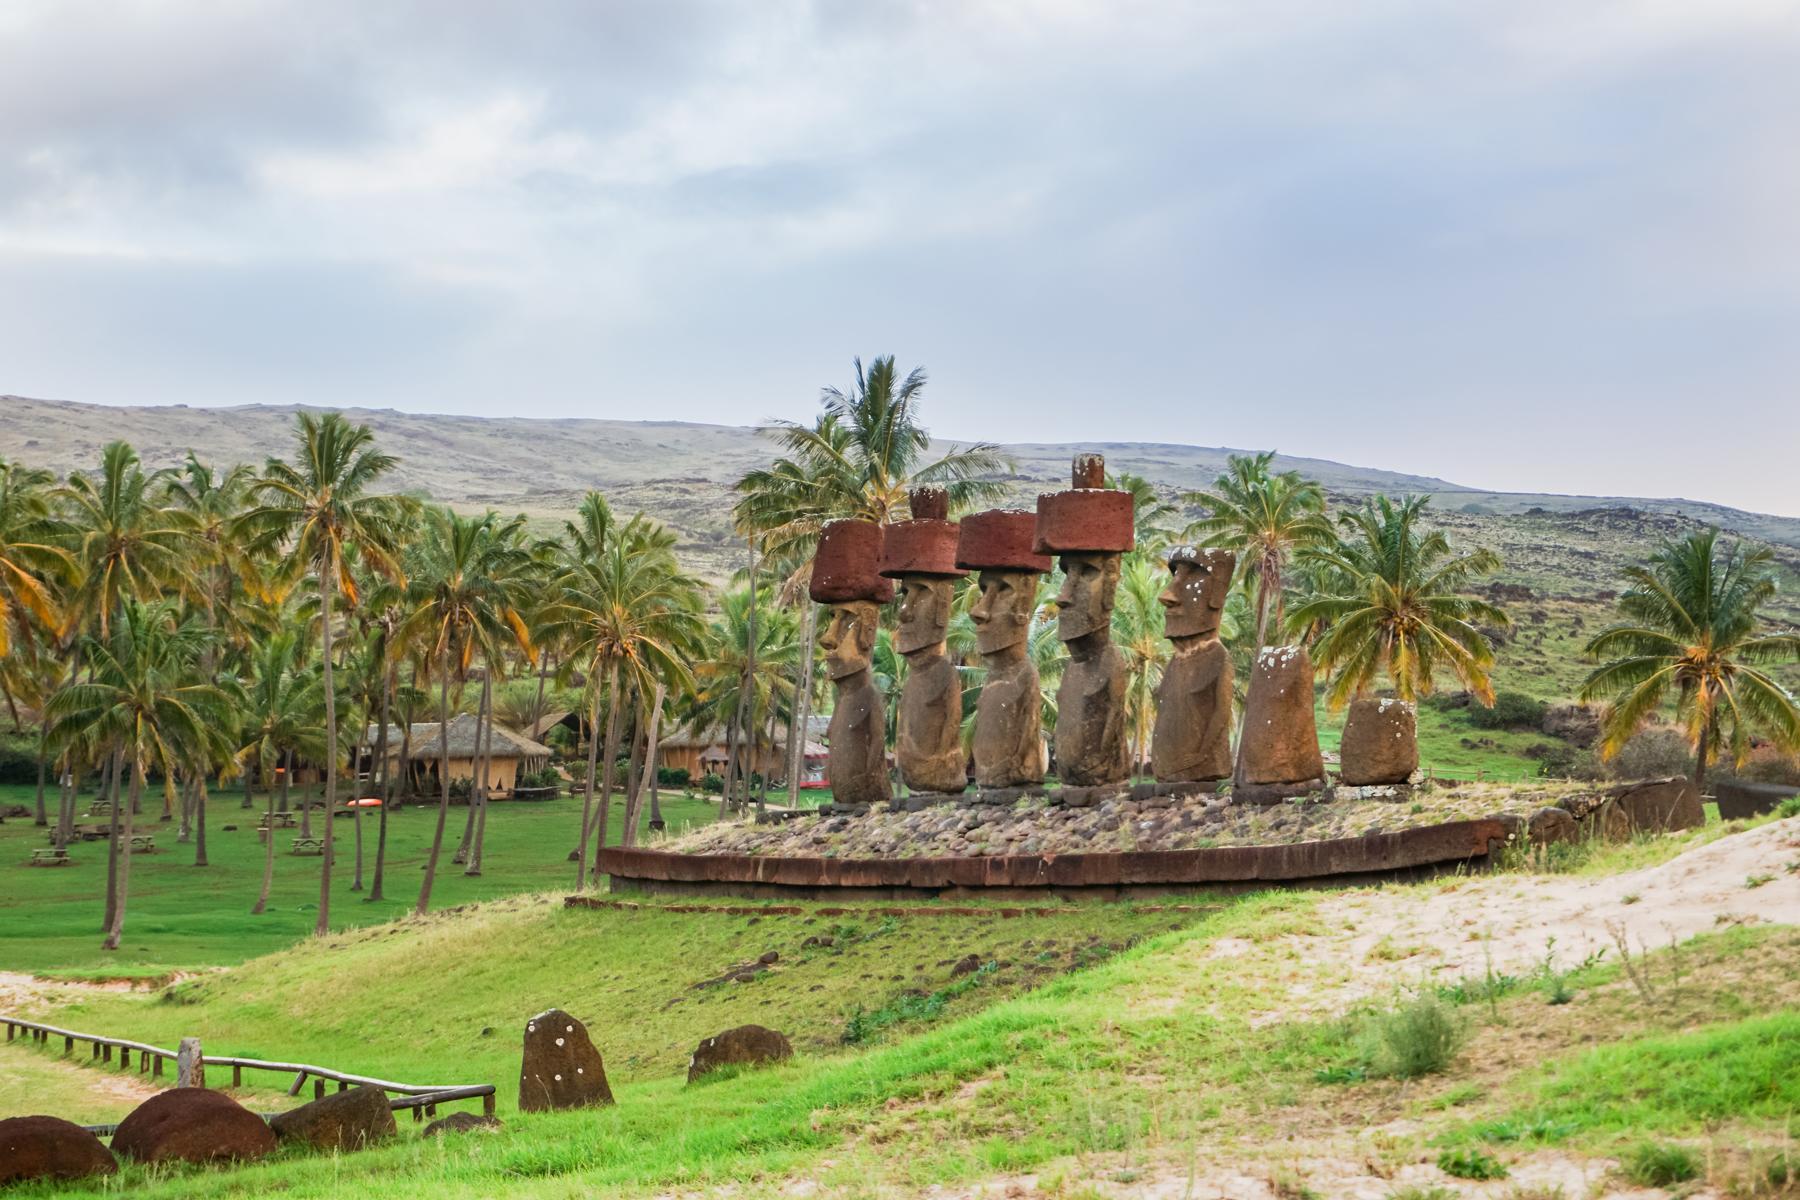 Easter-Island-LATAM-Eclipse-Flight_Moai-Anakena_1800x1200